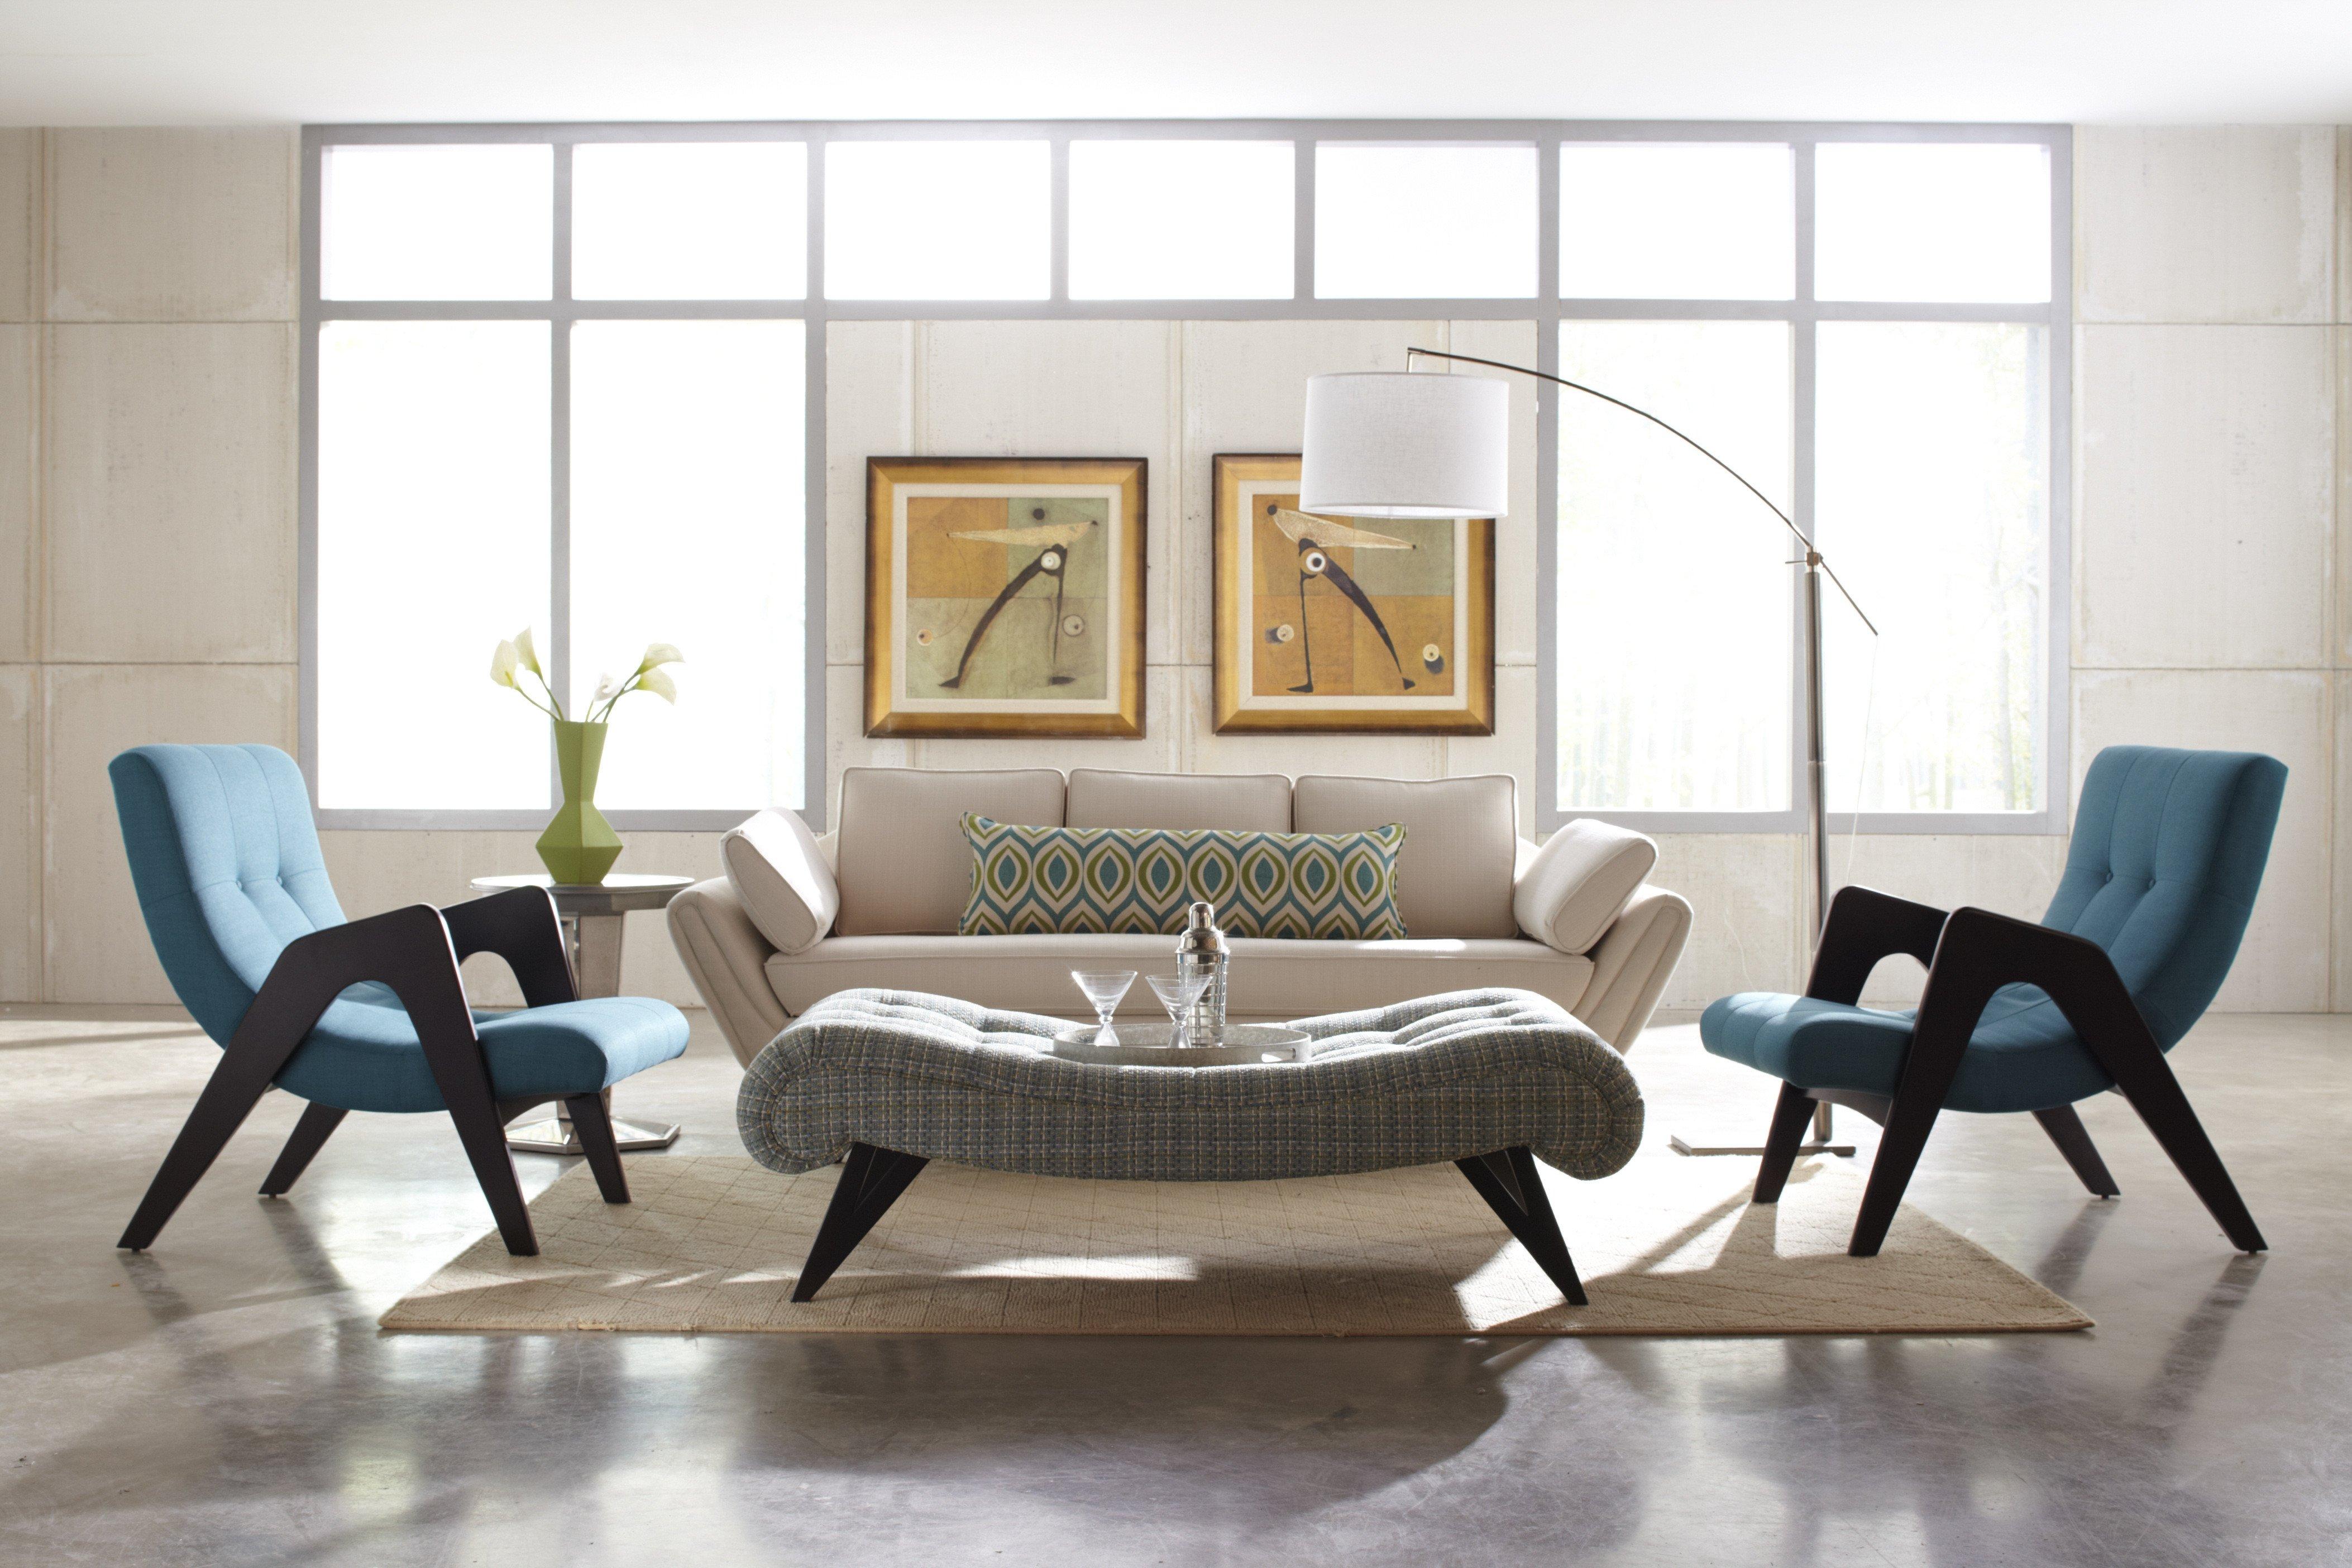 Mid Century Modern Decor Ideas Inspirational 3 Mid Century Modern Designs to Include In Your Home Reno